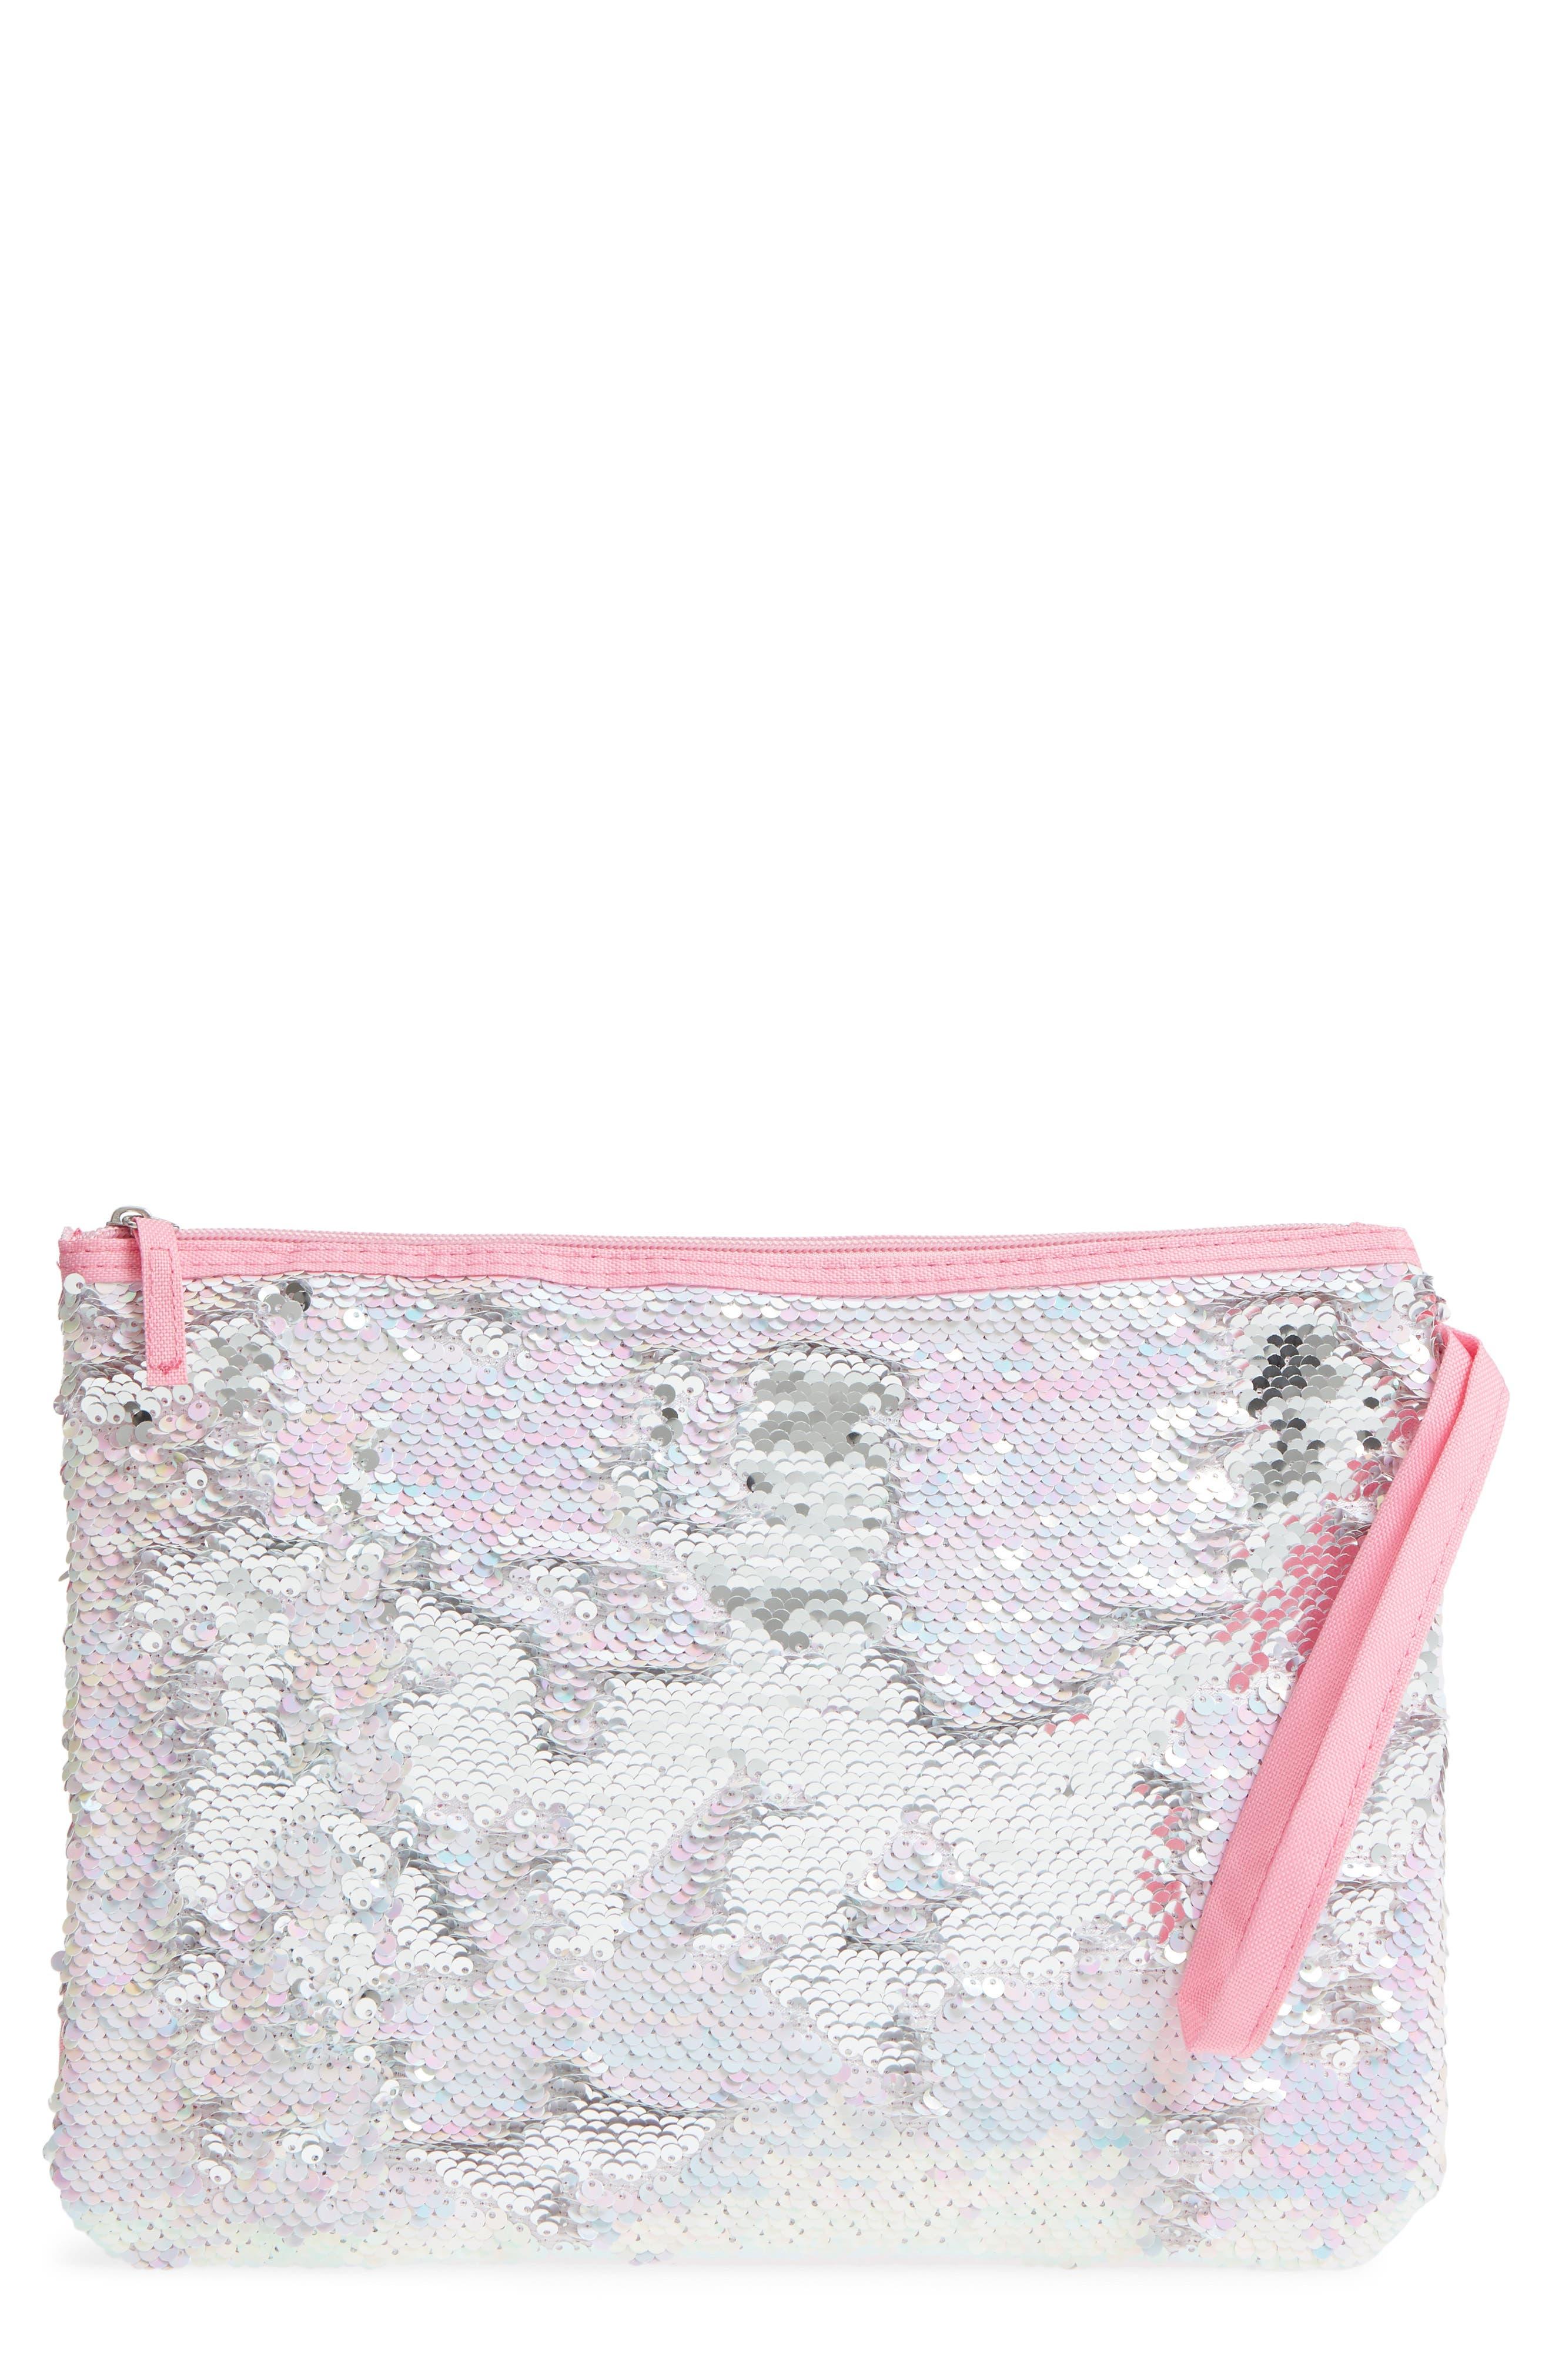 Sequin Bikini Bag,                         Main,                         color, Pink Combo